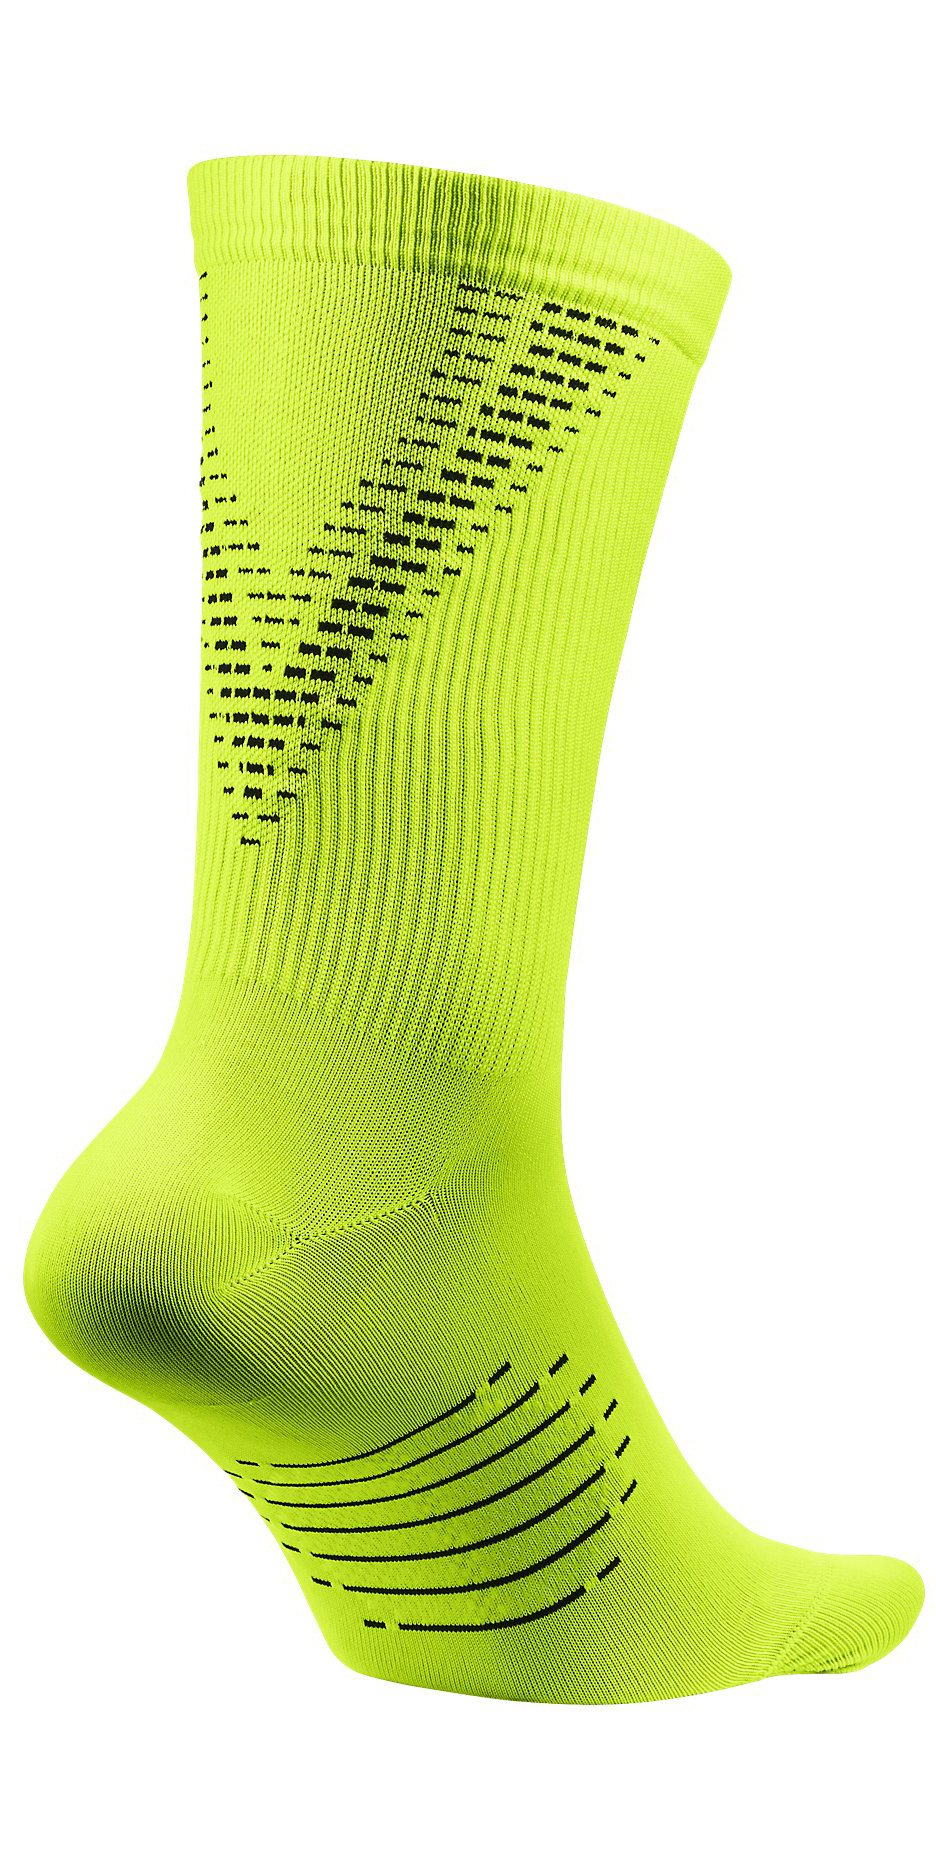 Ponožky Nike  ELITE RUN LTWT 2.0 CREW